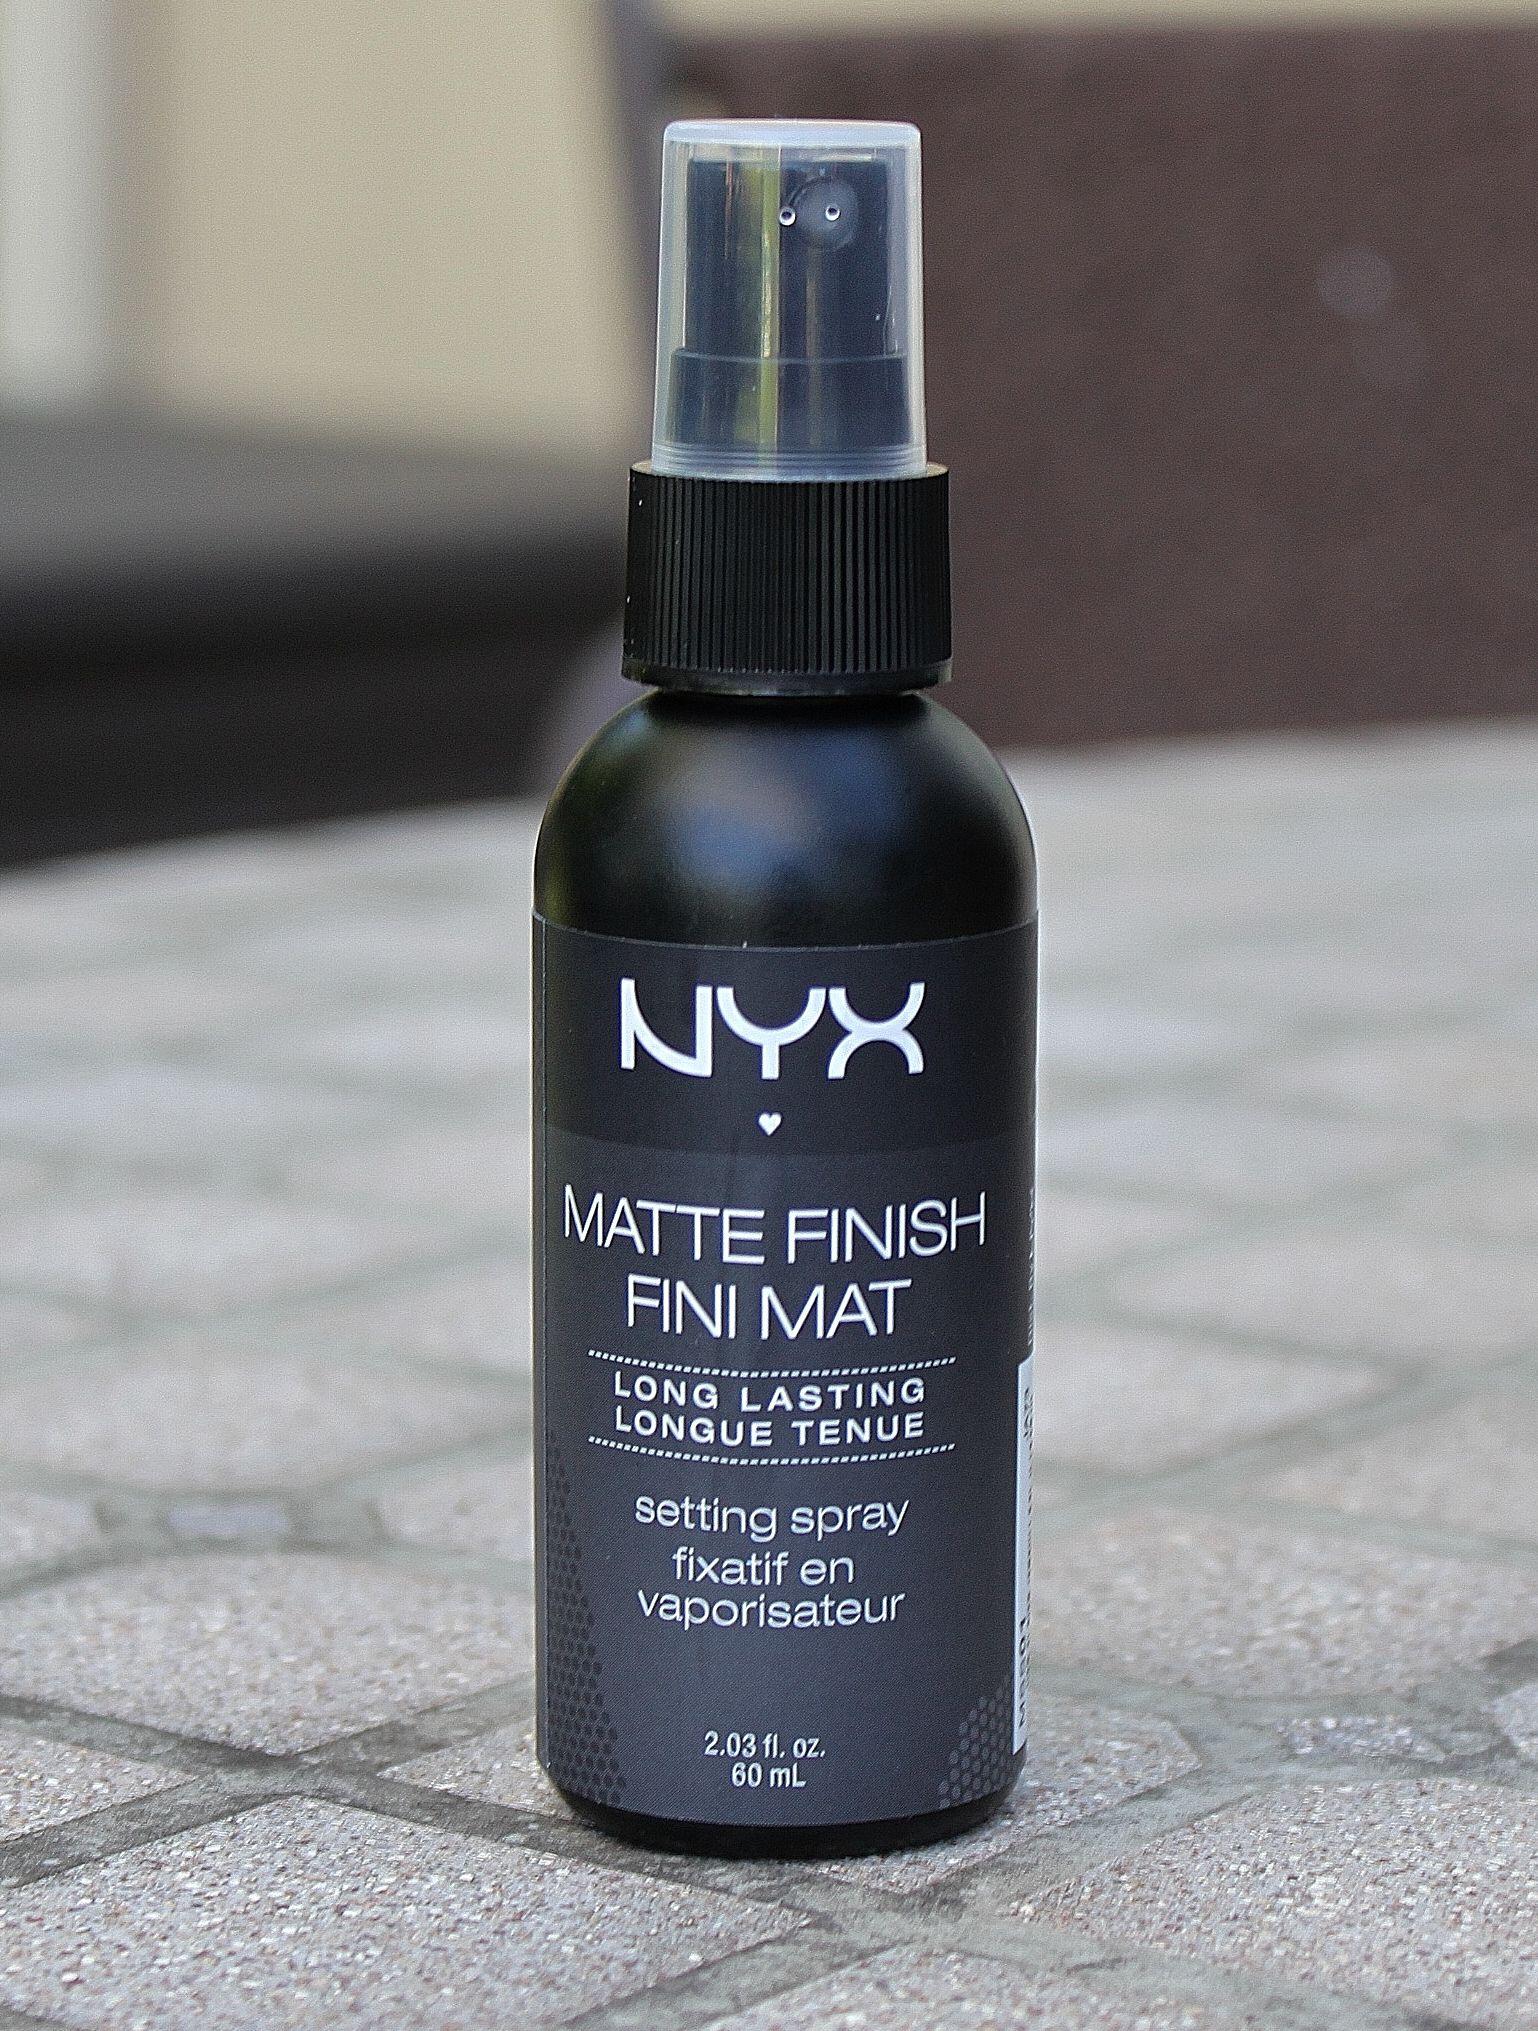 Nyx Matte Finish Setting Spray ♥ Photos & Review Nyx